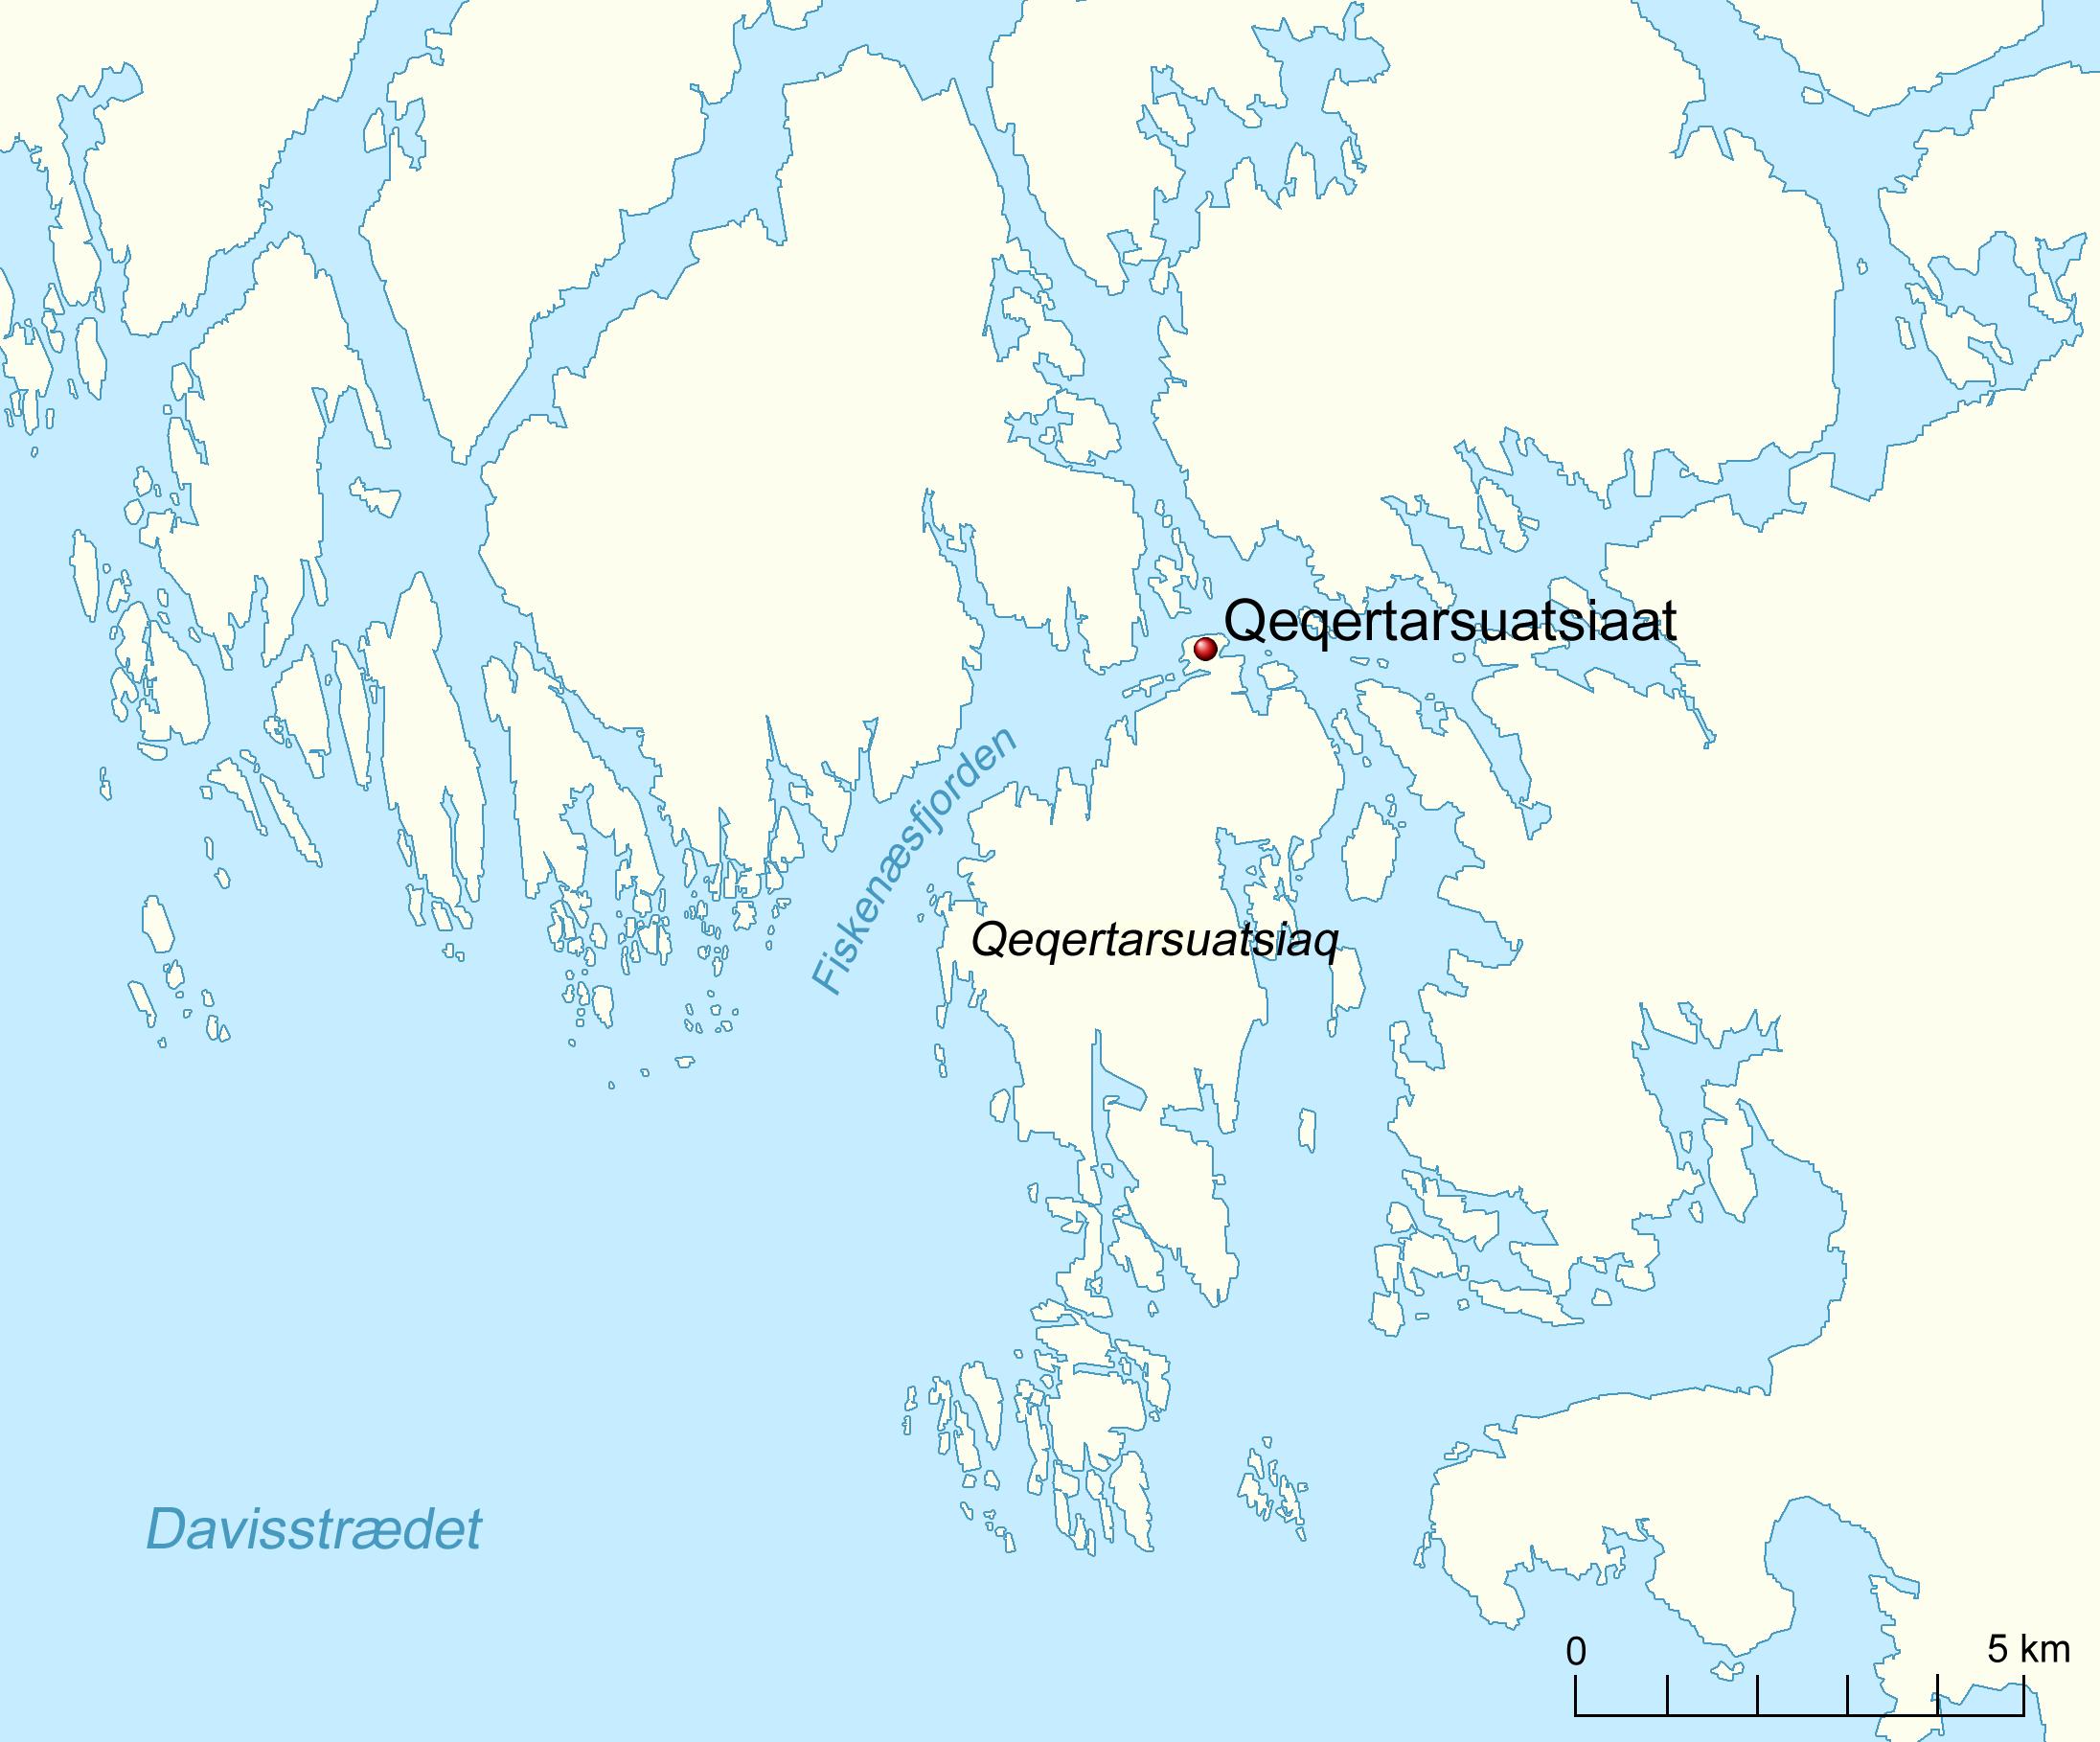 dating island Favrskov